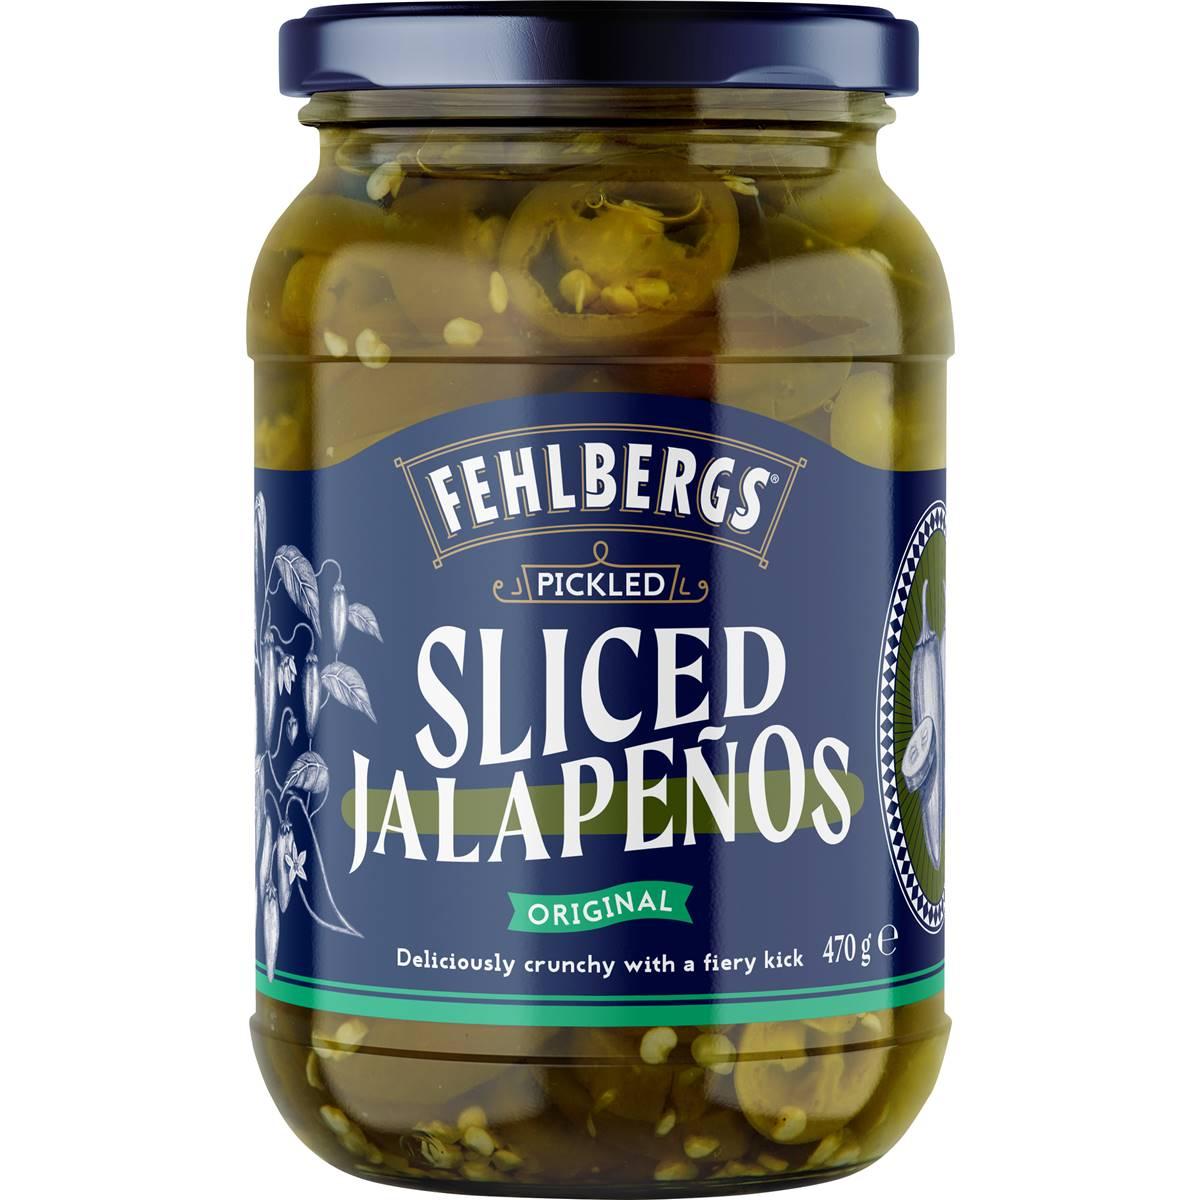 Fehlbergs Jalapenos Pickled